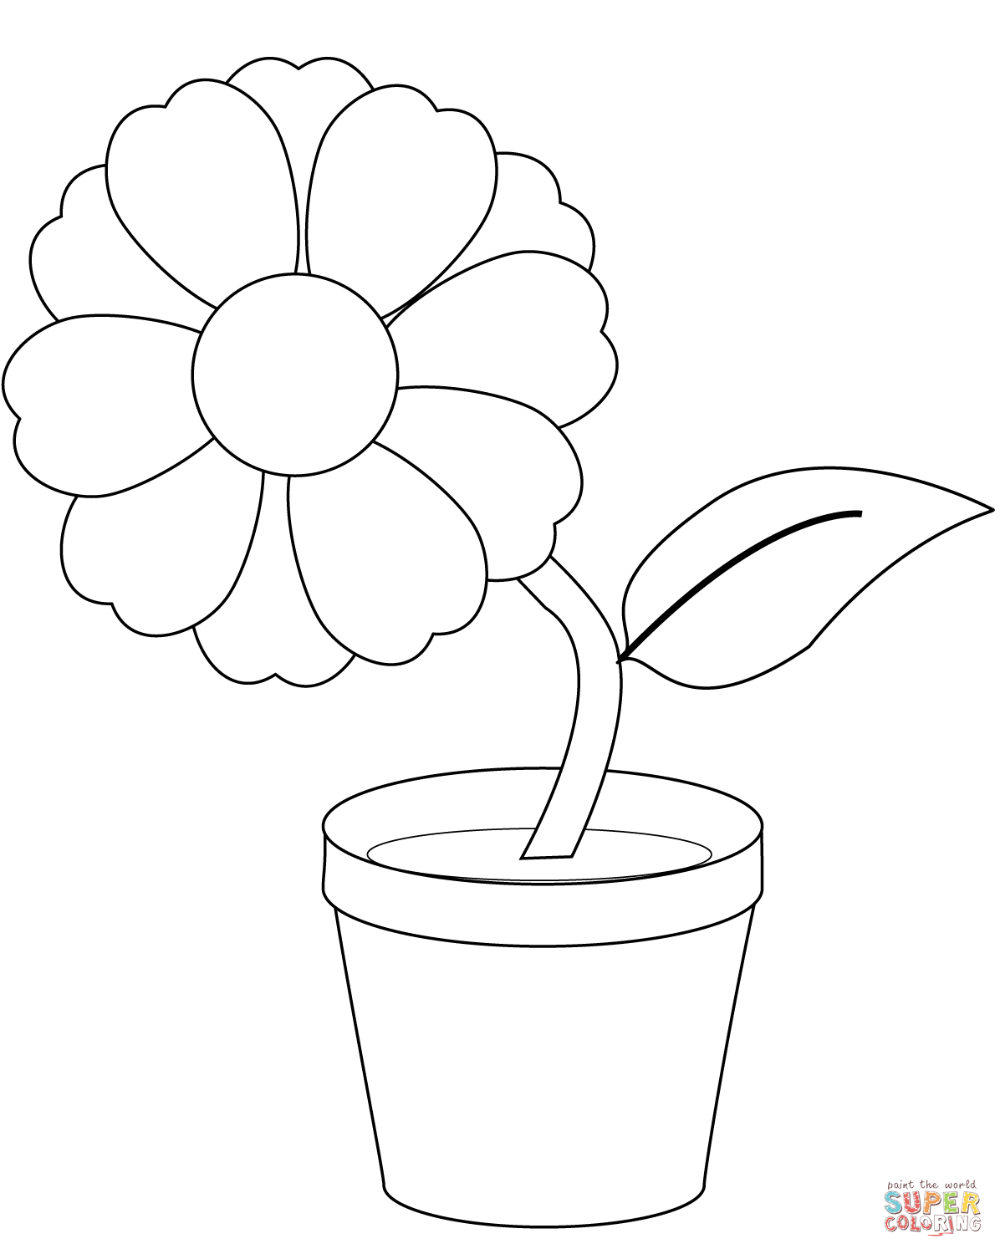 Maceta Con Flor Super Coloring Dibujos De Macetas Paginas Para Colorear Paginas Para Colorear De Flores